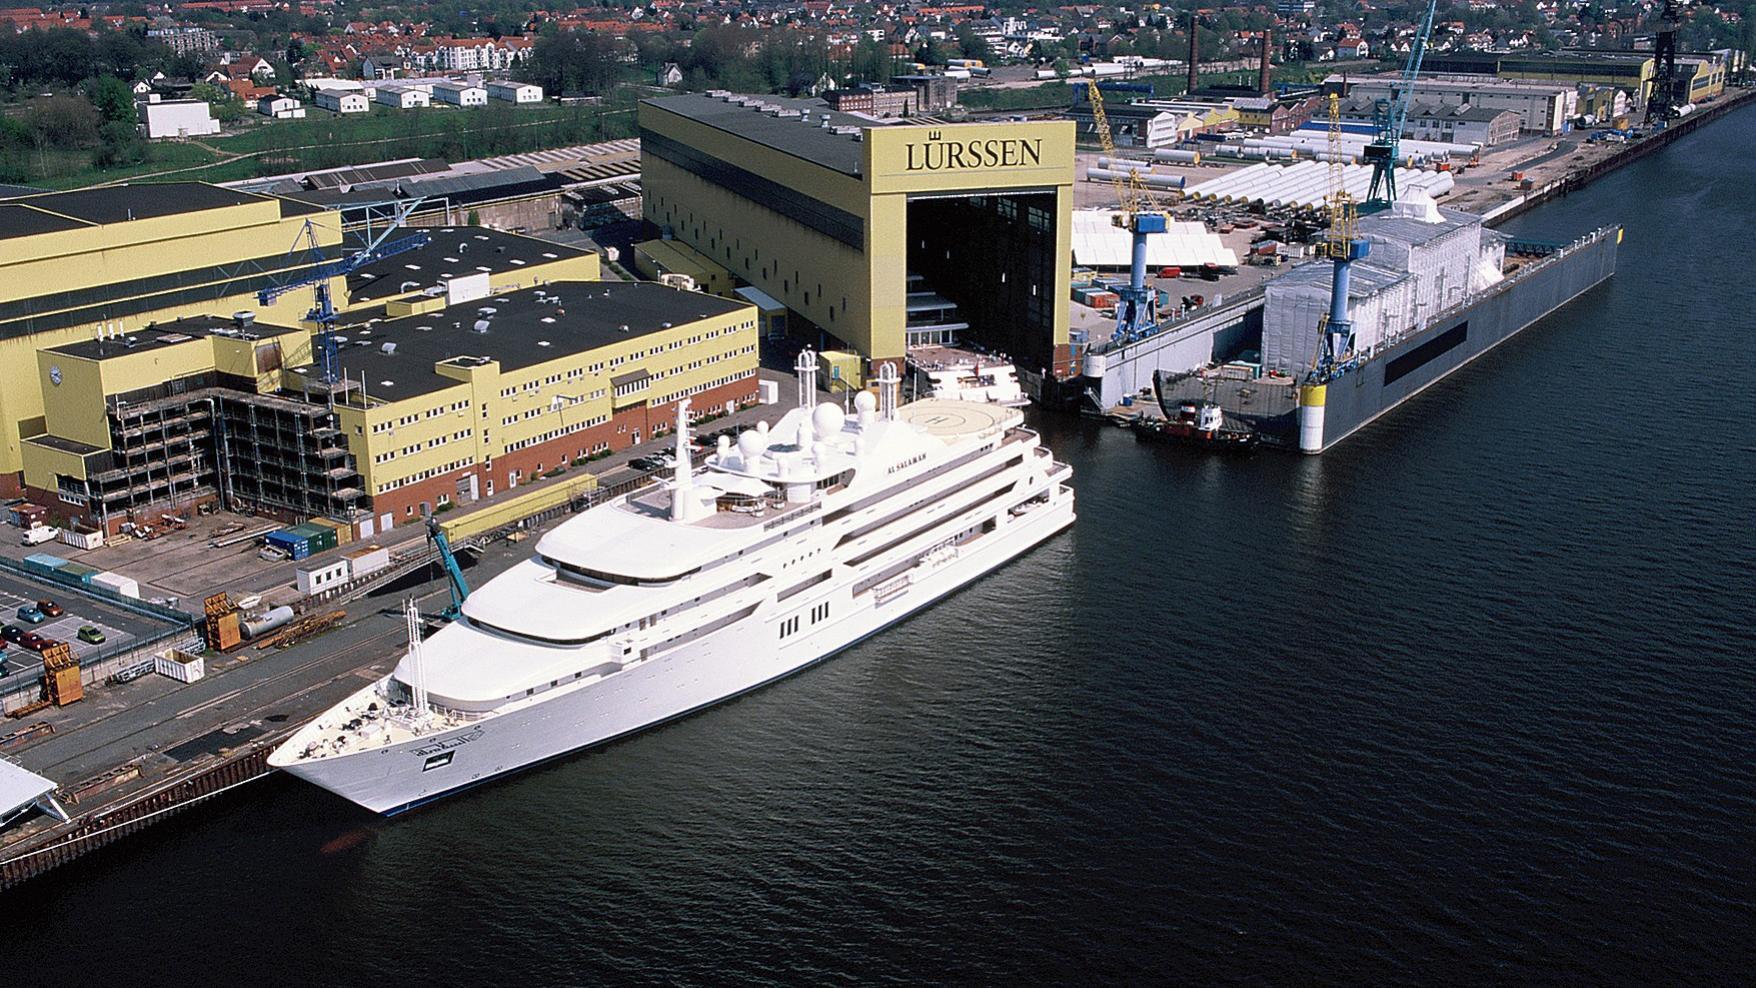 Al Salamah yacht at Lurssen shipyard